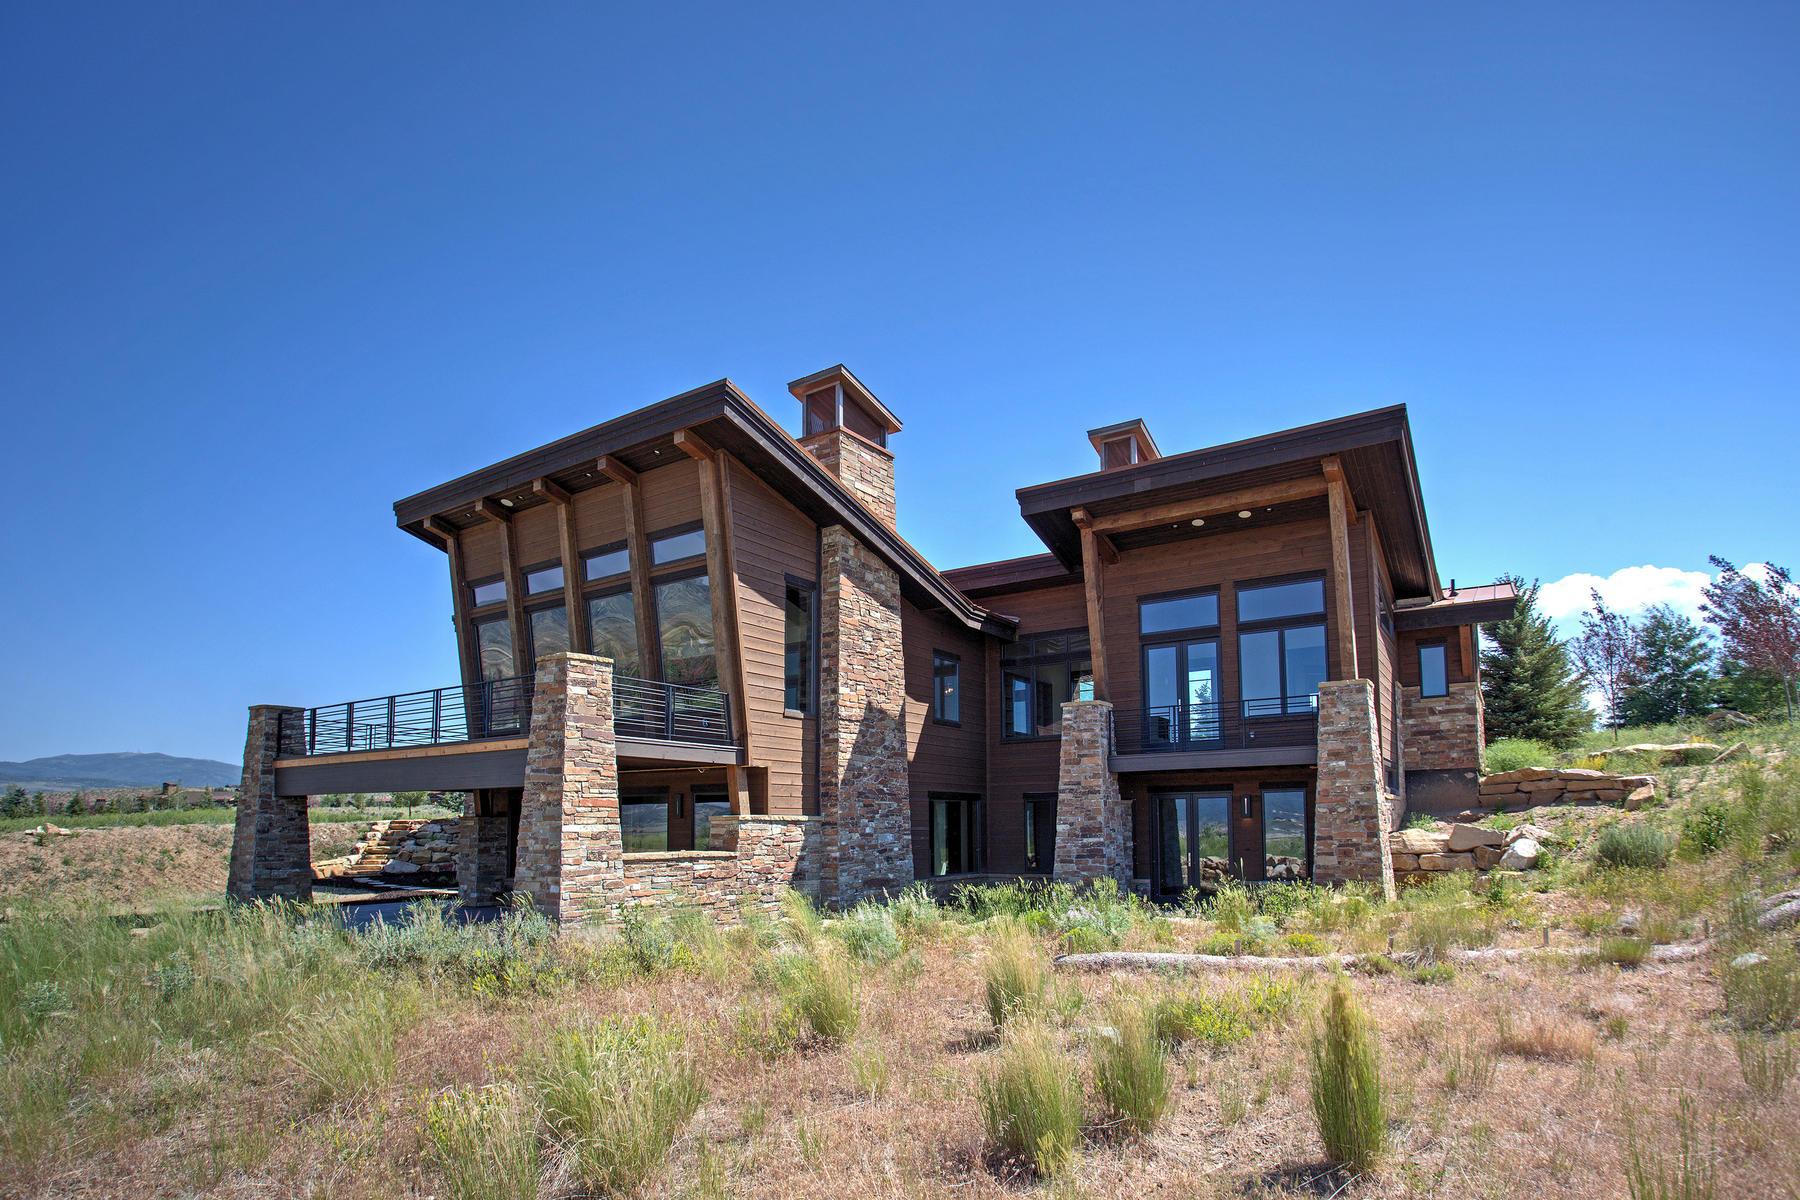 Villa per Vendita alle ore New Construction in Promontory with Panoramic Views of Park City's Three Ski Res 6803 Cody Trail Park City, Utah, 84098 Stati Uniti